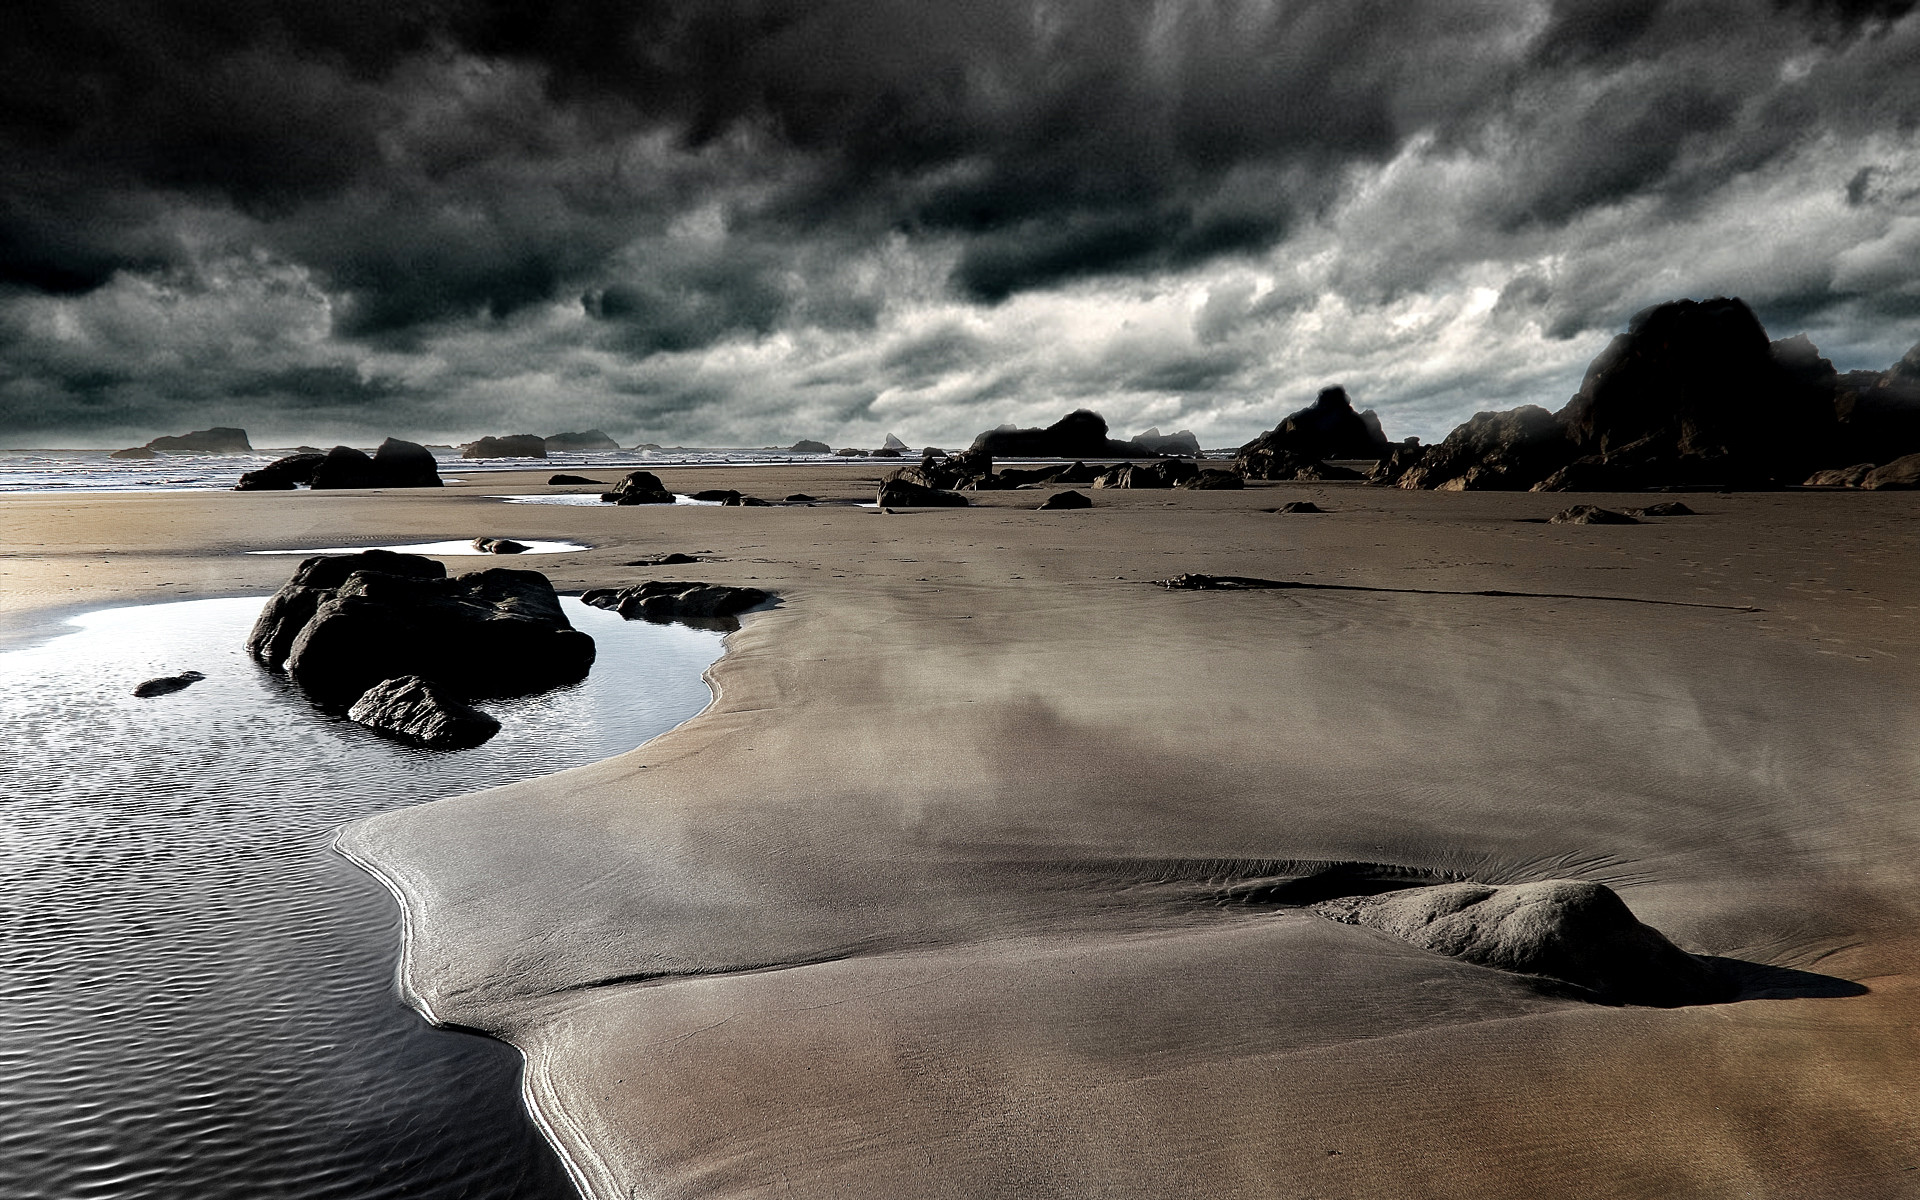 stormy beach wallpaper hd photo